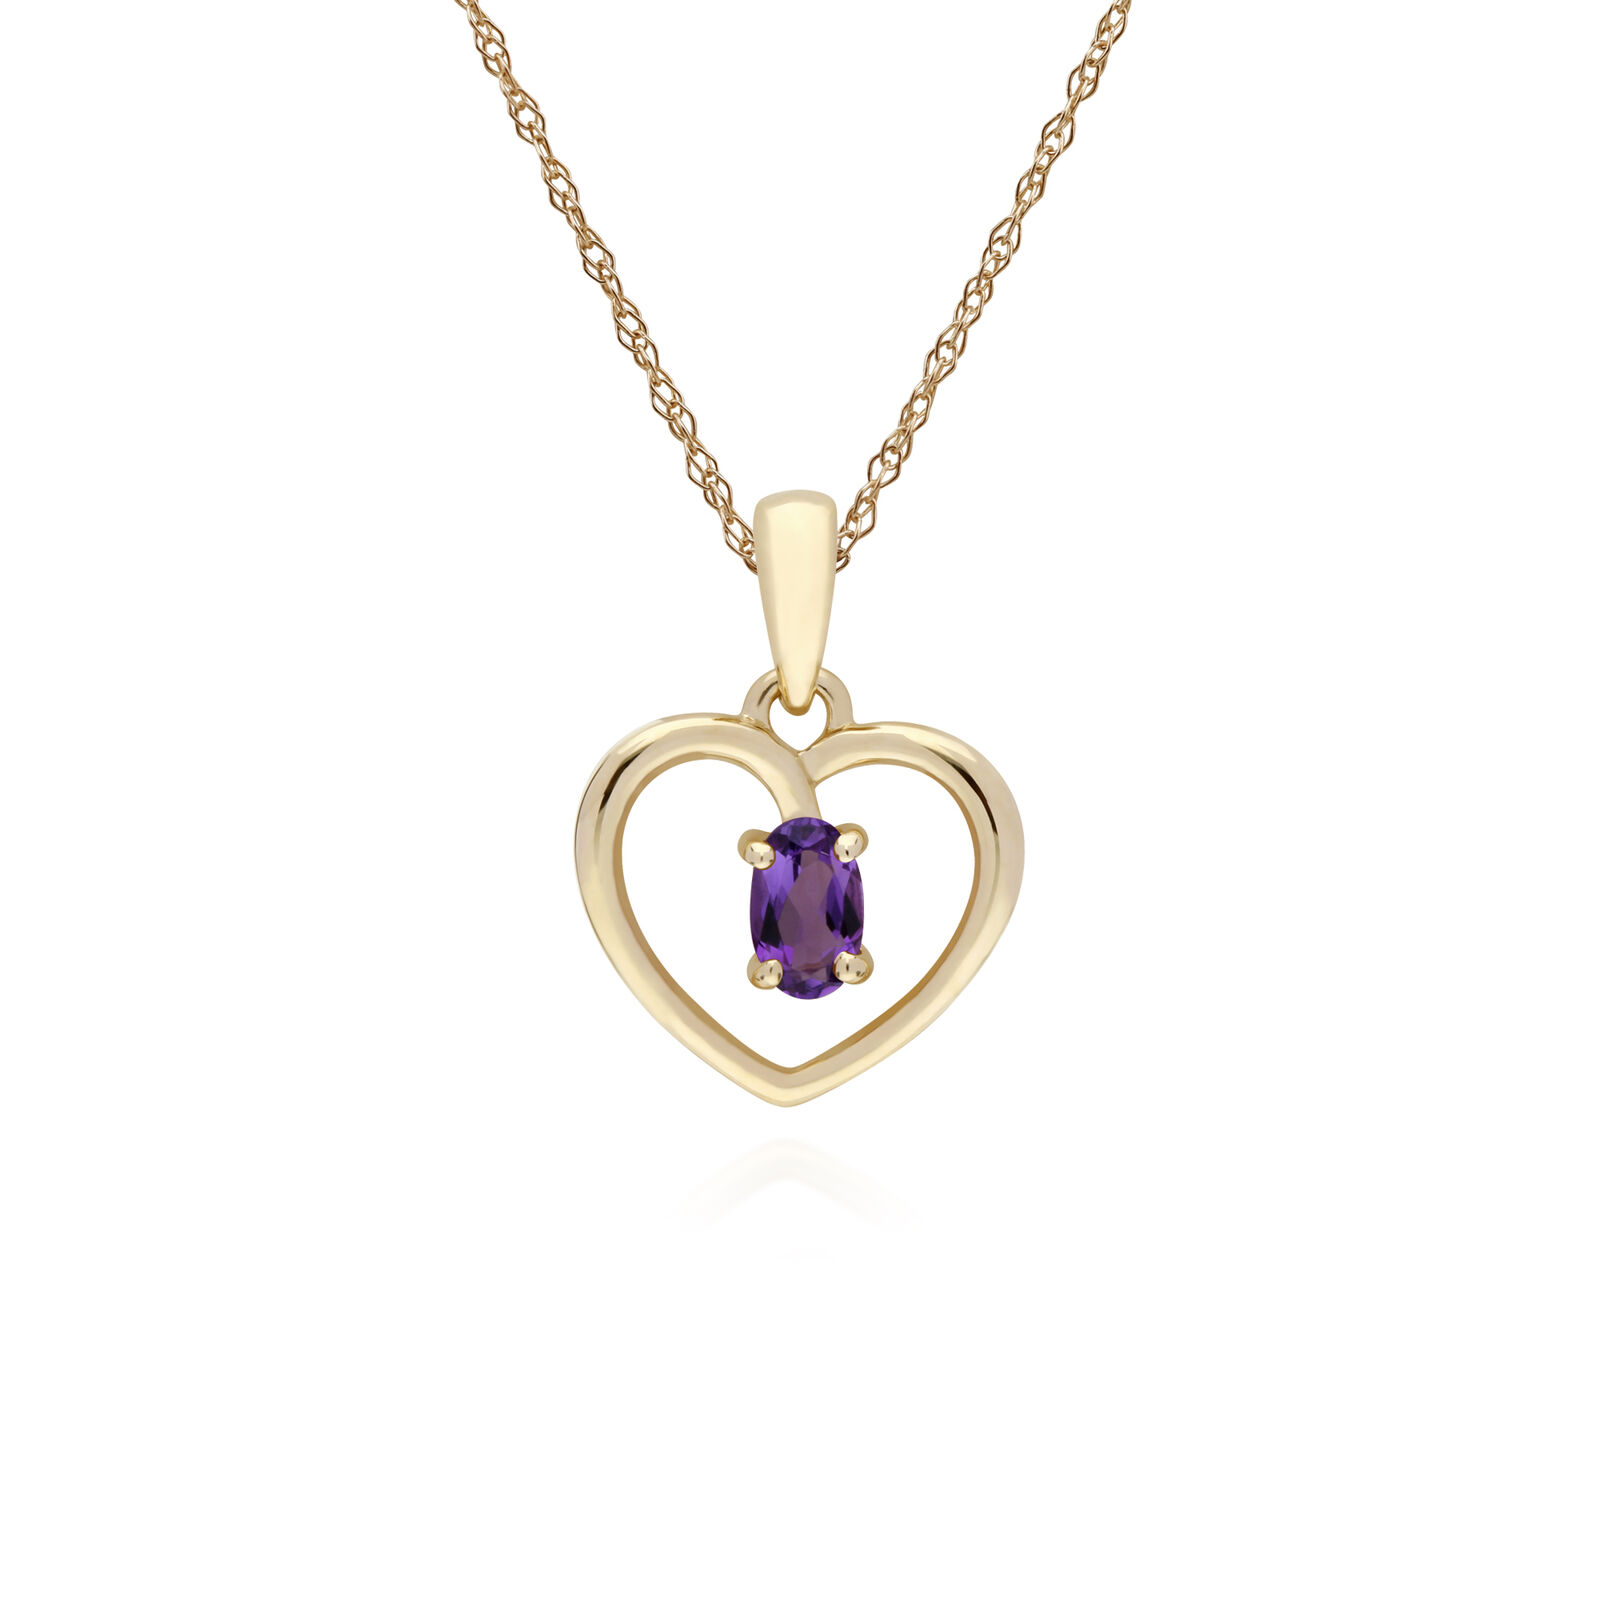 Gemondo 9ct Yellow gold Amethyst Oval Single Stone Heart Pendant on 45cm Chain